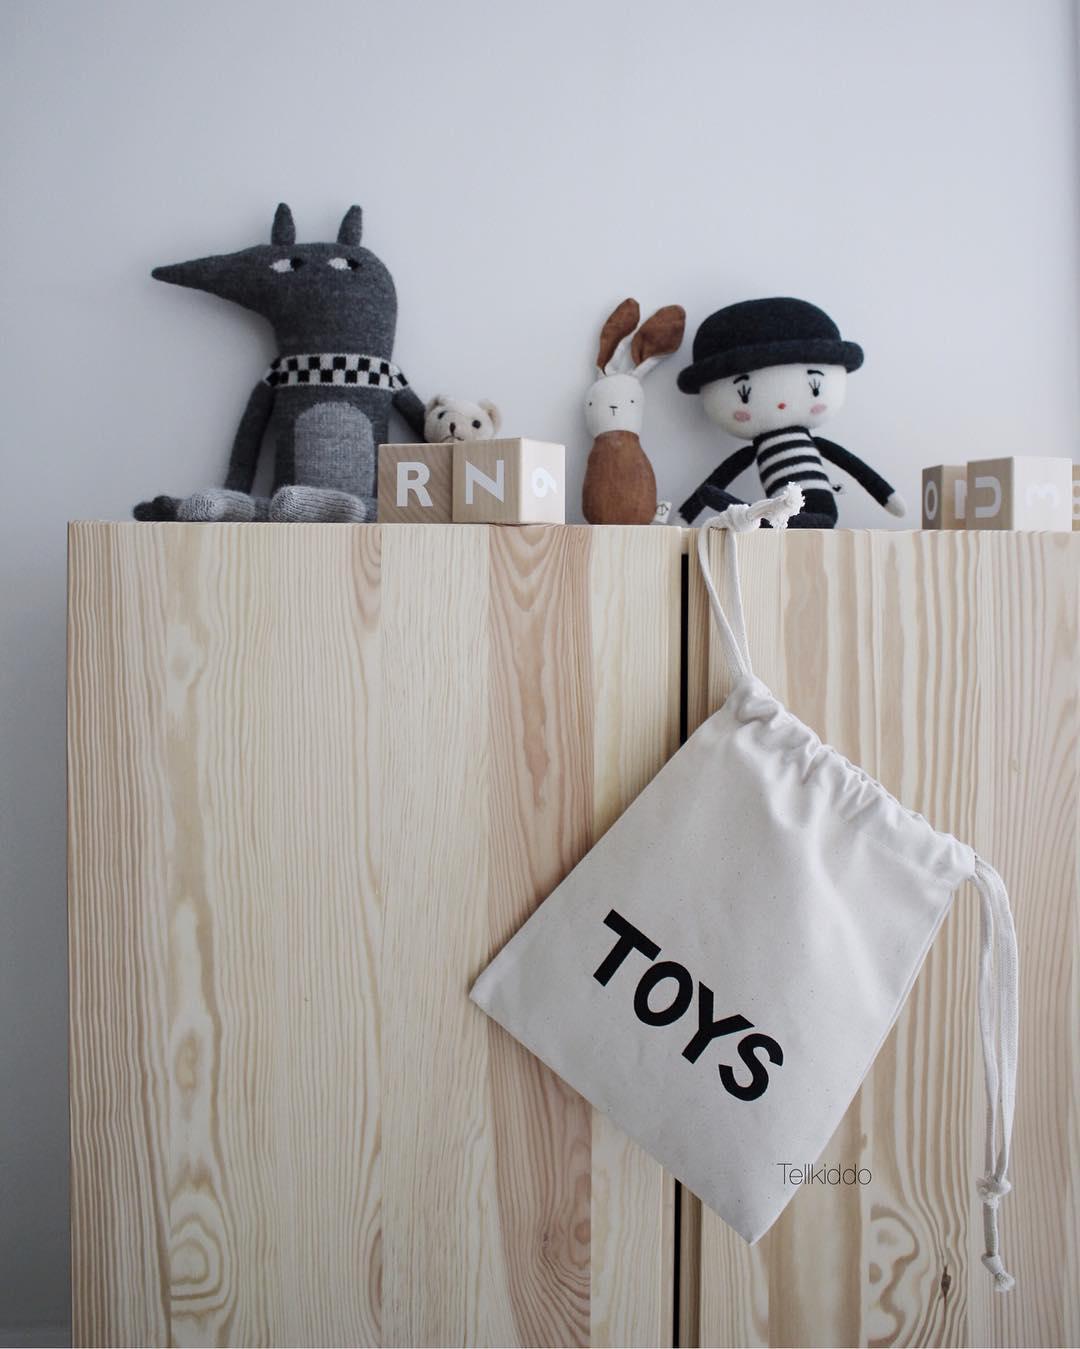 Tellkiddo 瑞典可愛圖案帆布收納袋 Toys (小)1